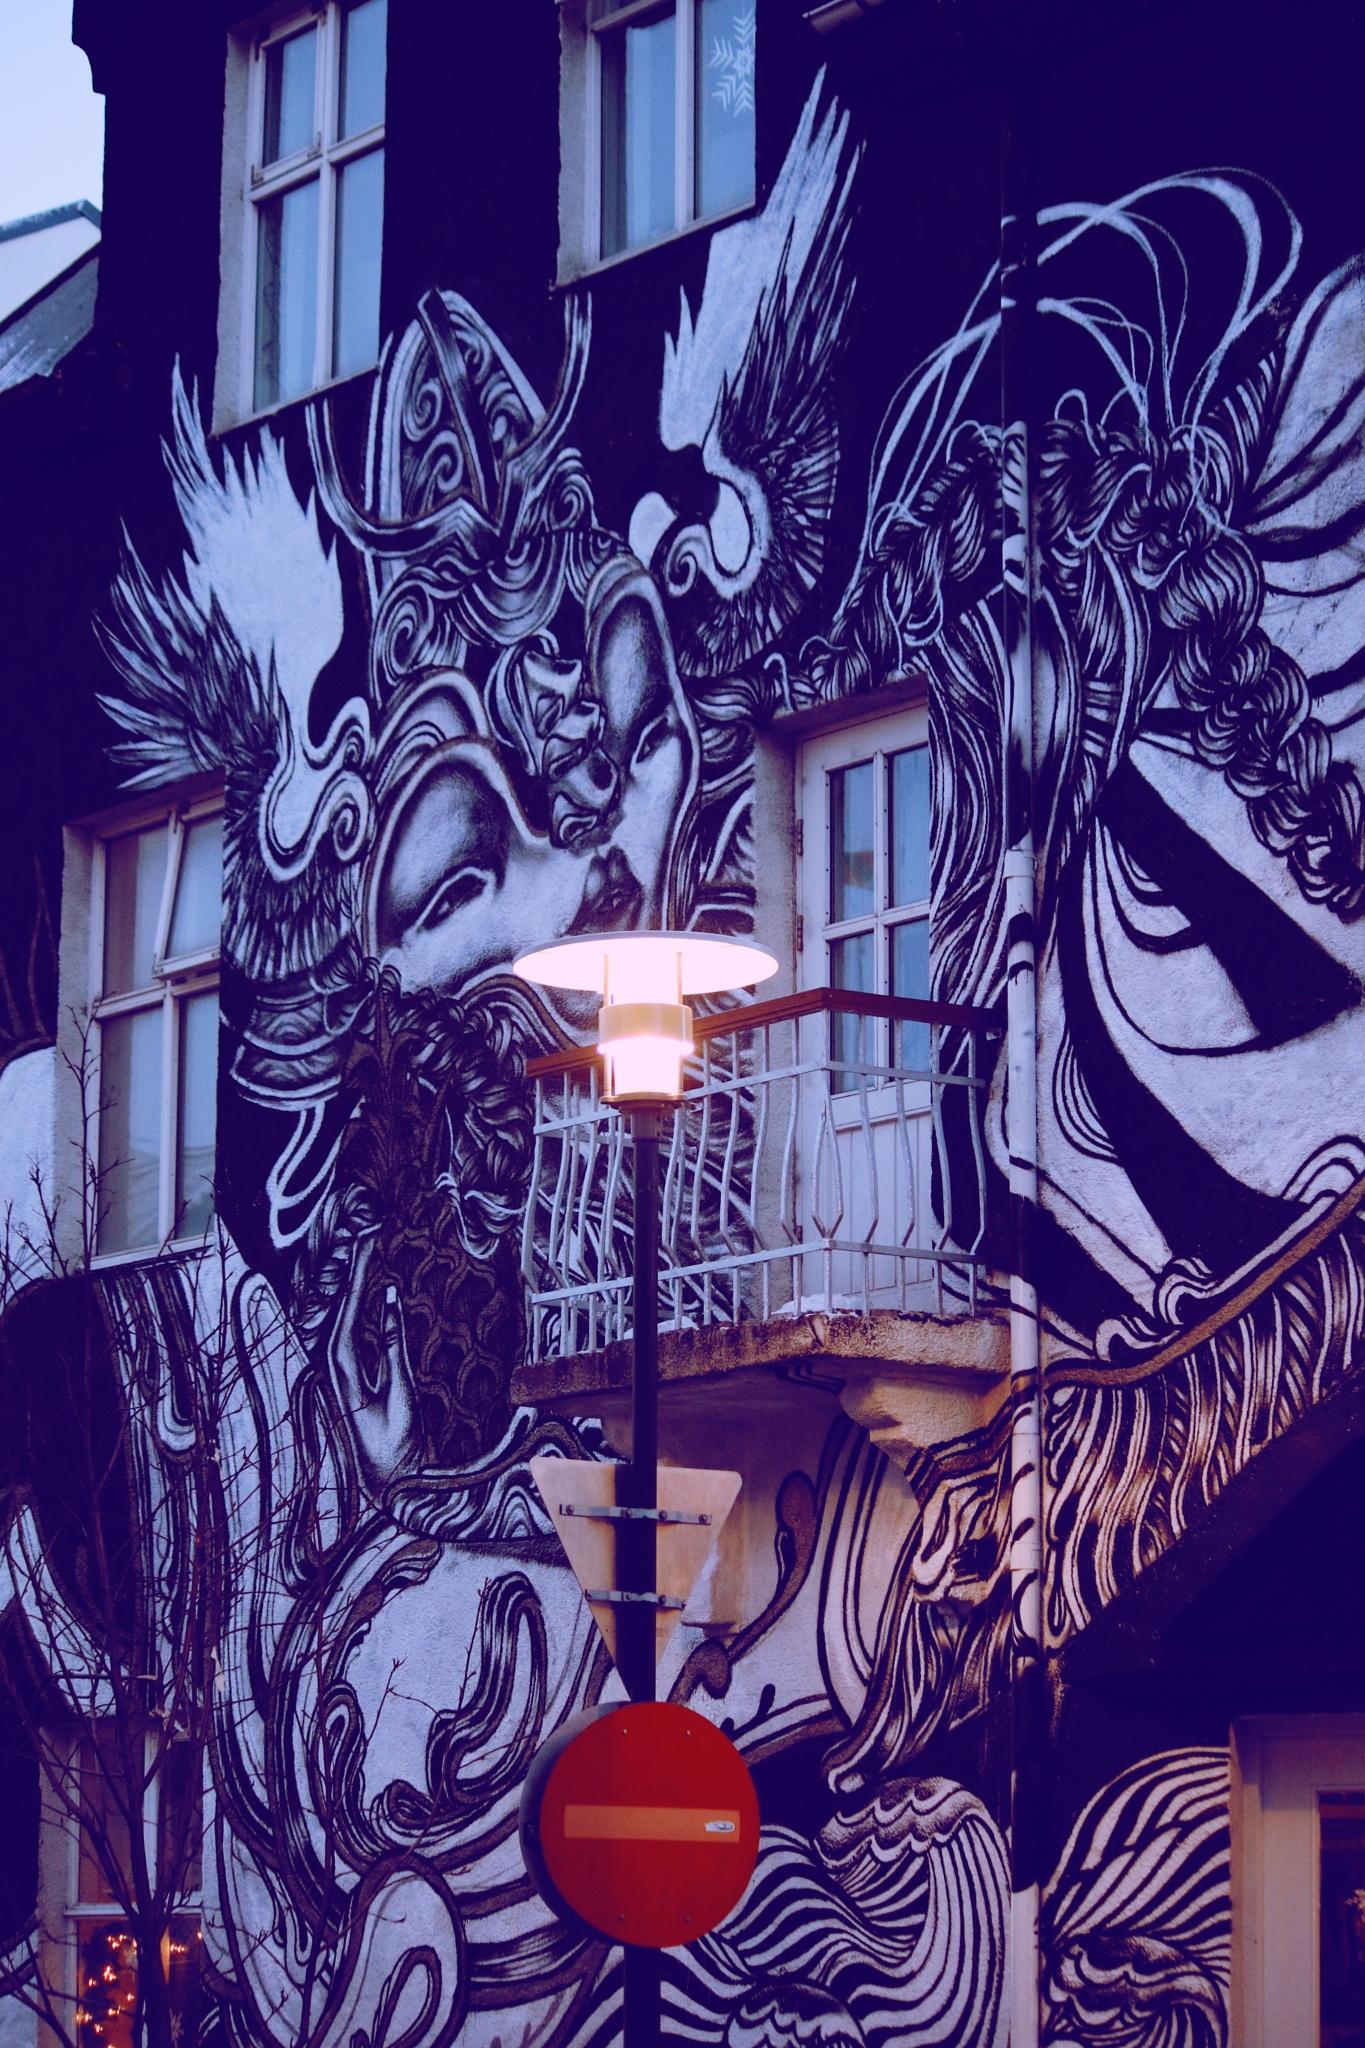 Street Art In Iceland by PaulWhiteman